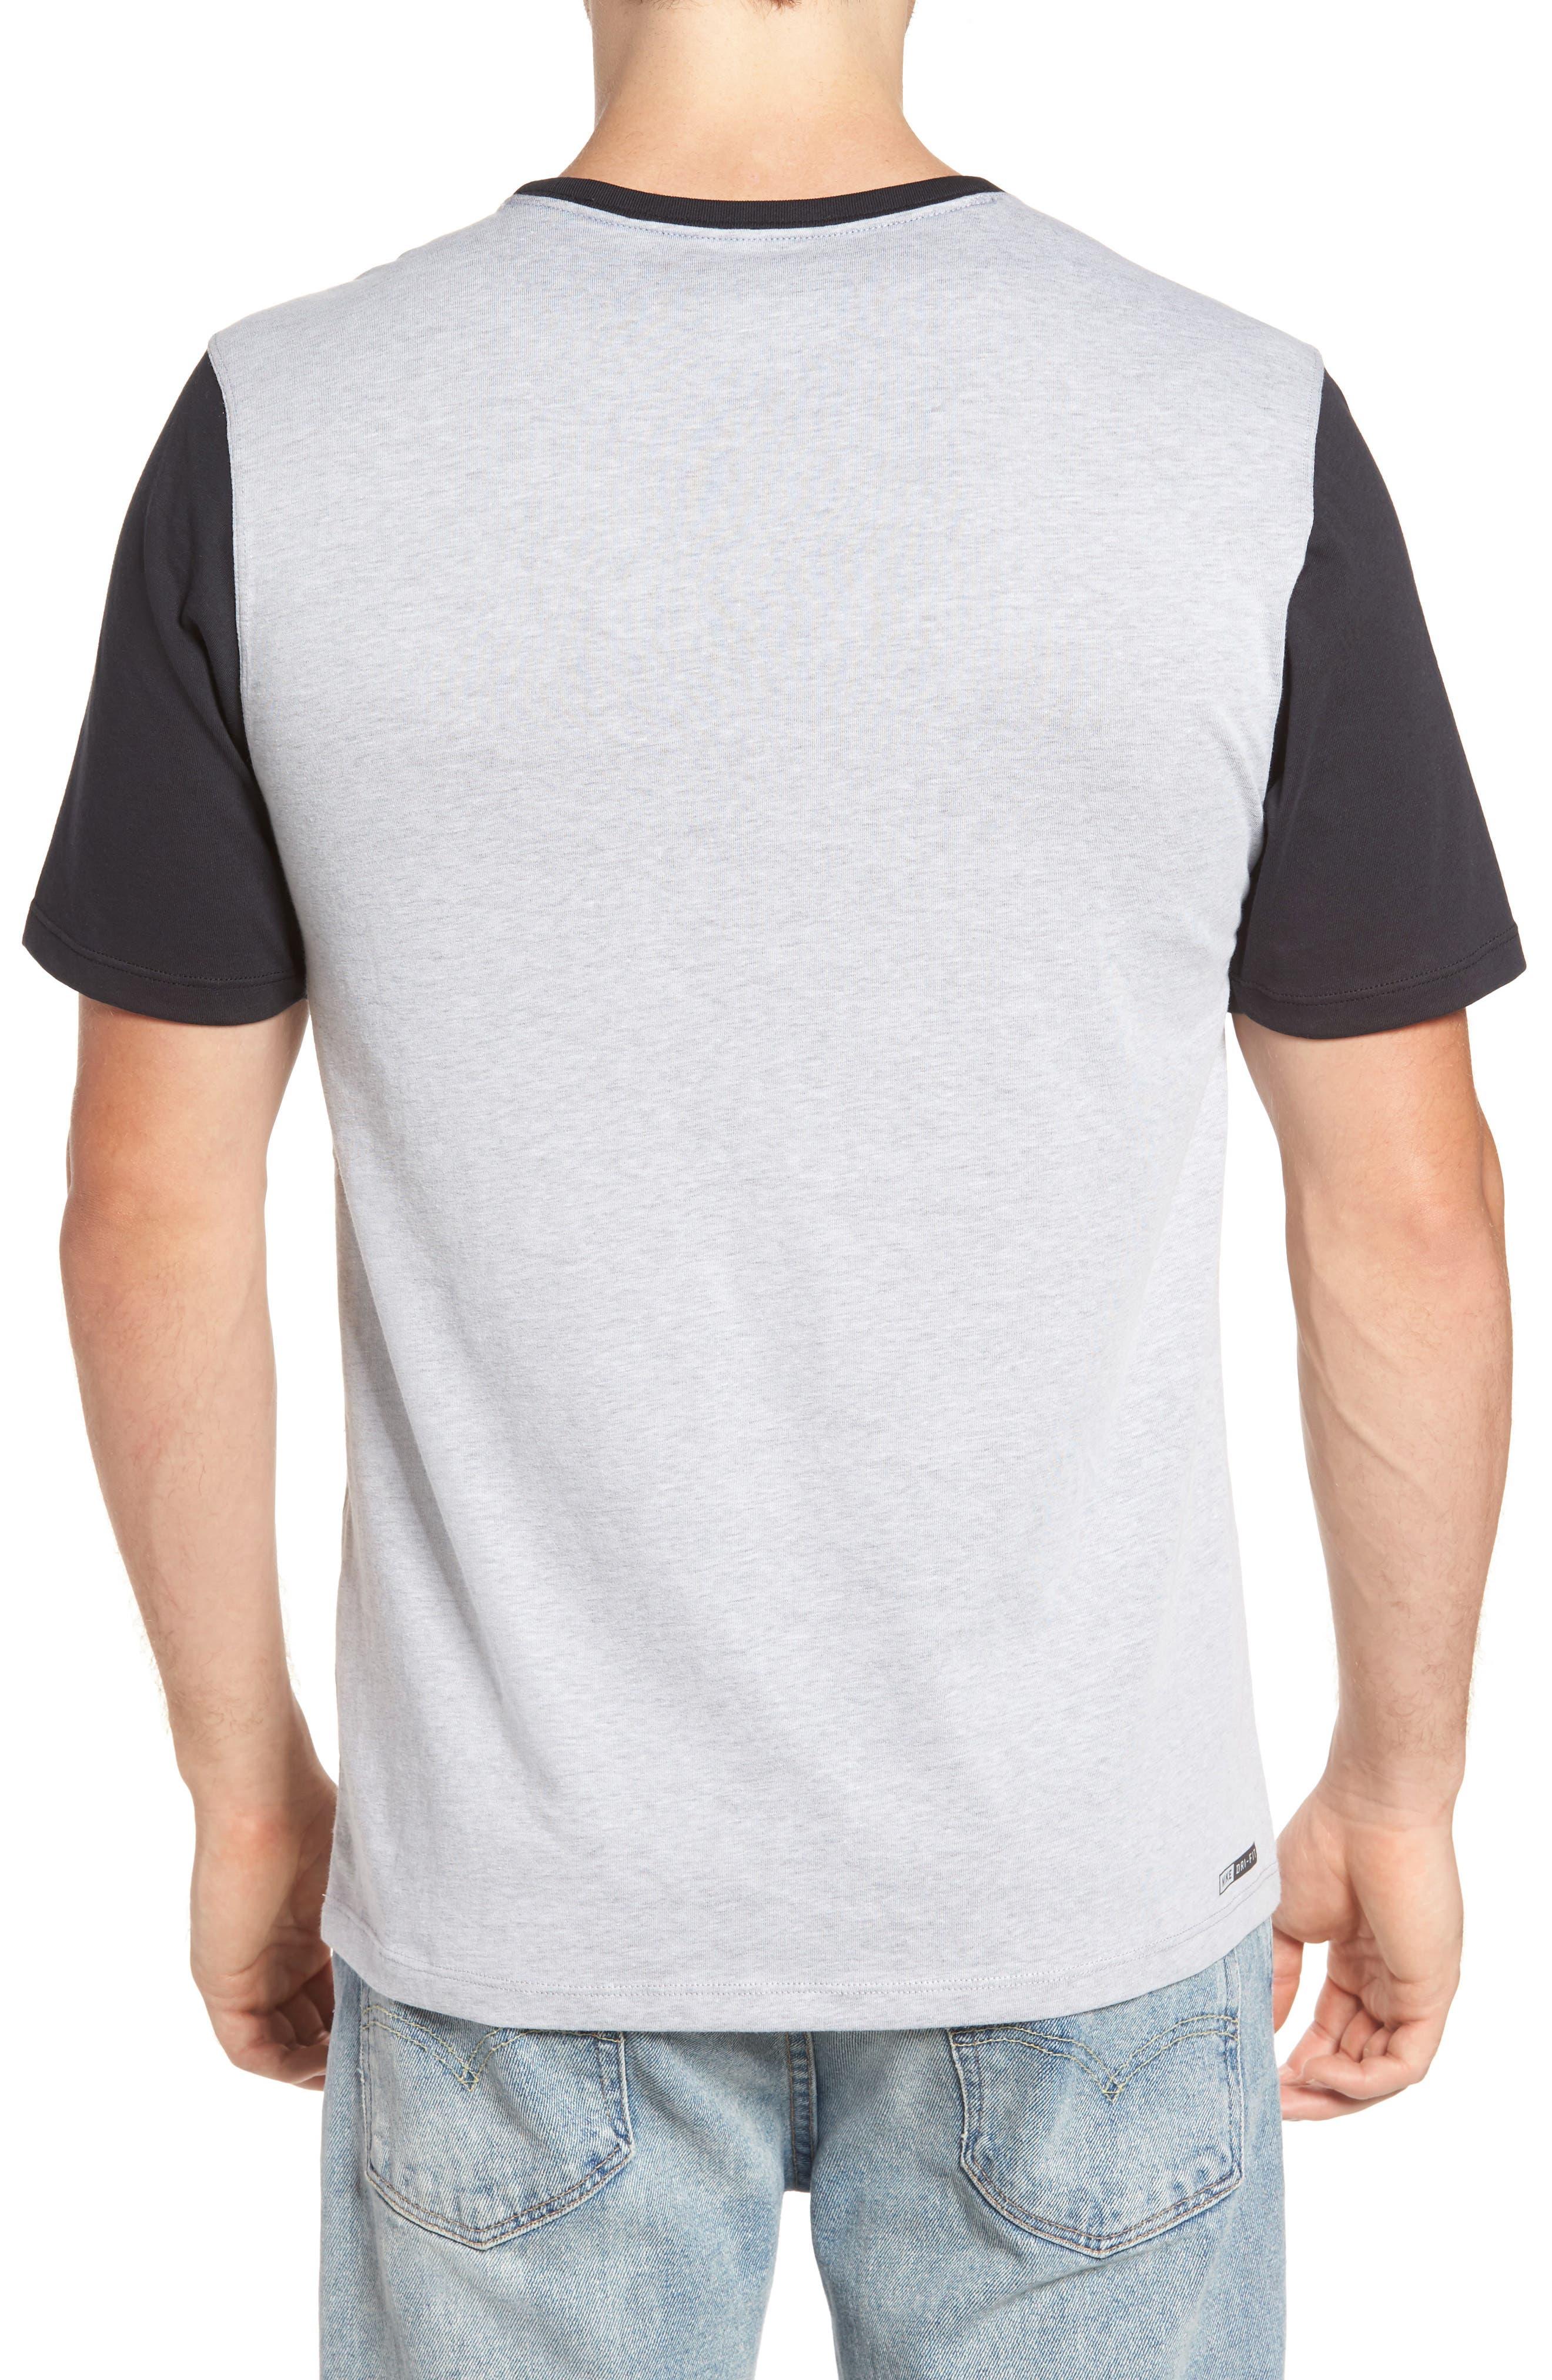 Lagos Snapper Dri-FIT T-Shirt,                             Alternate thumbnail 2, color,                             059